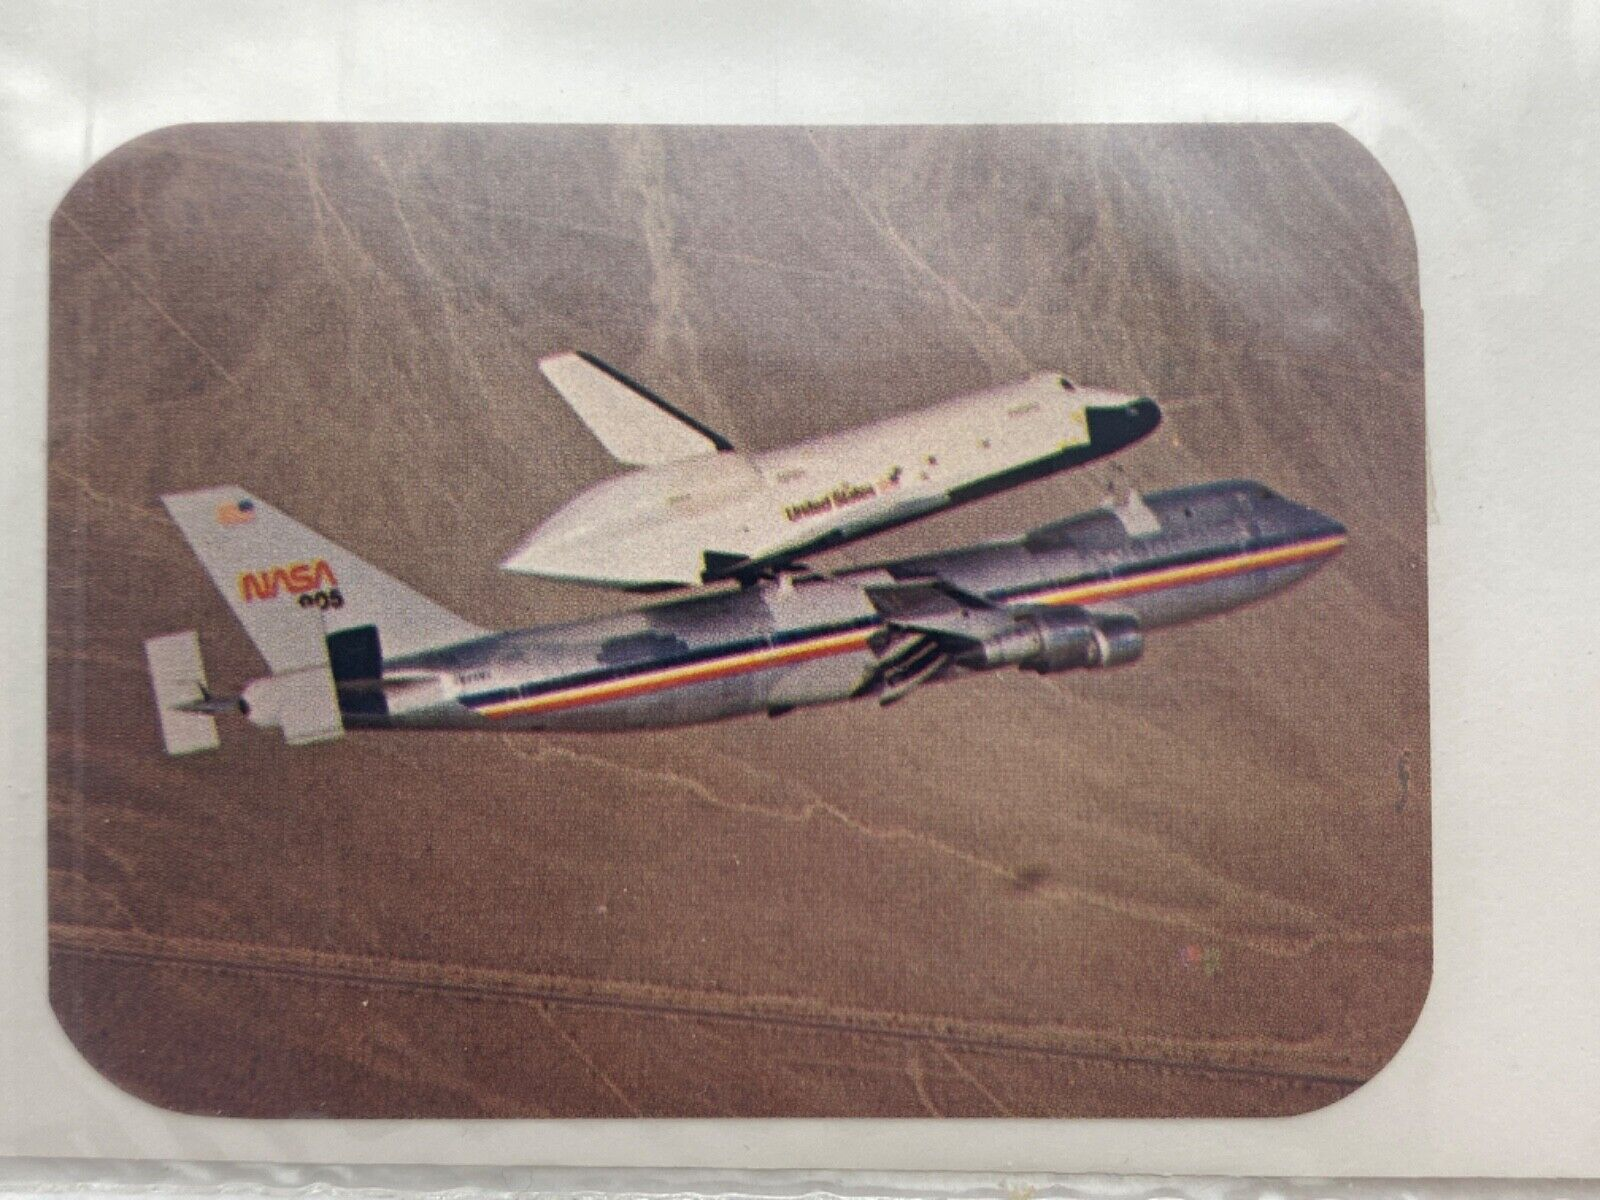 US Postal History Maiden Manned Test Space Shuttle Enterprise Edwards CA 15 - $1.25